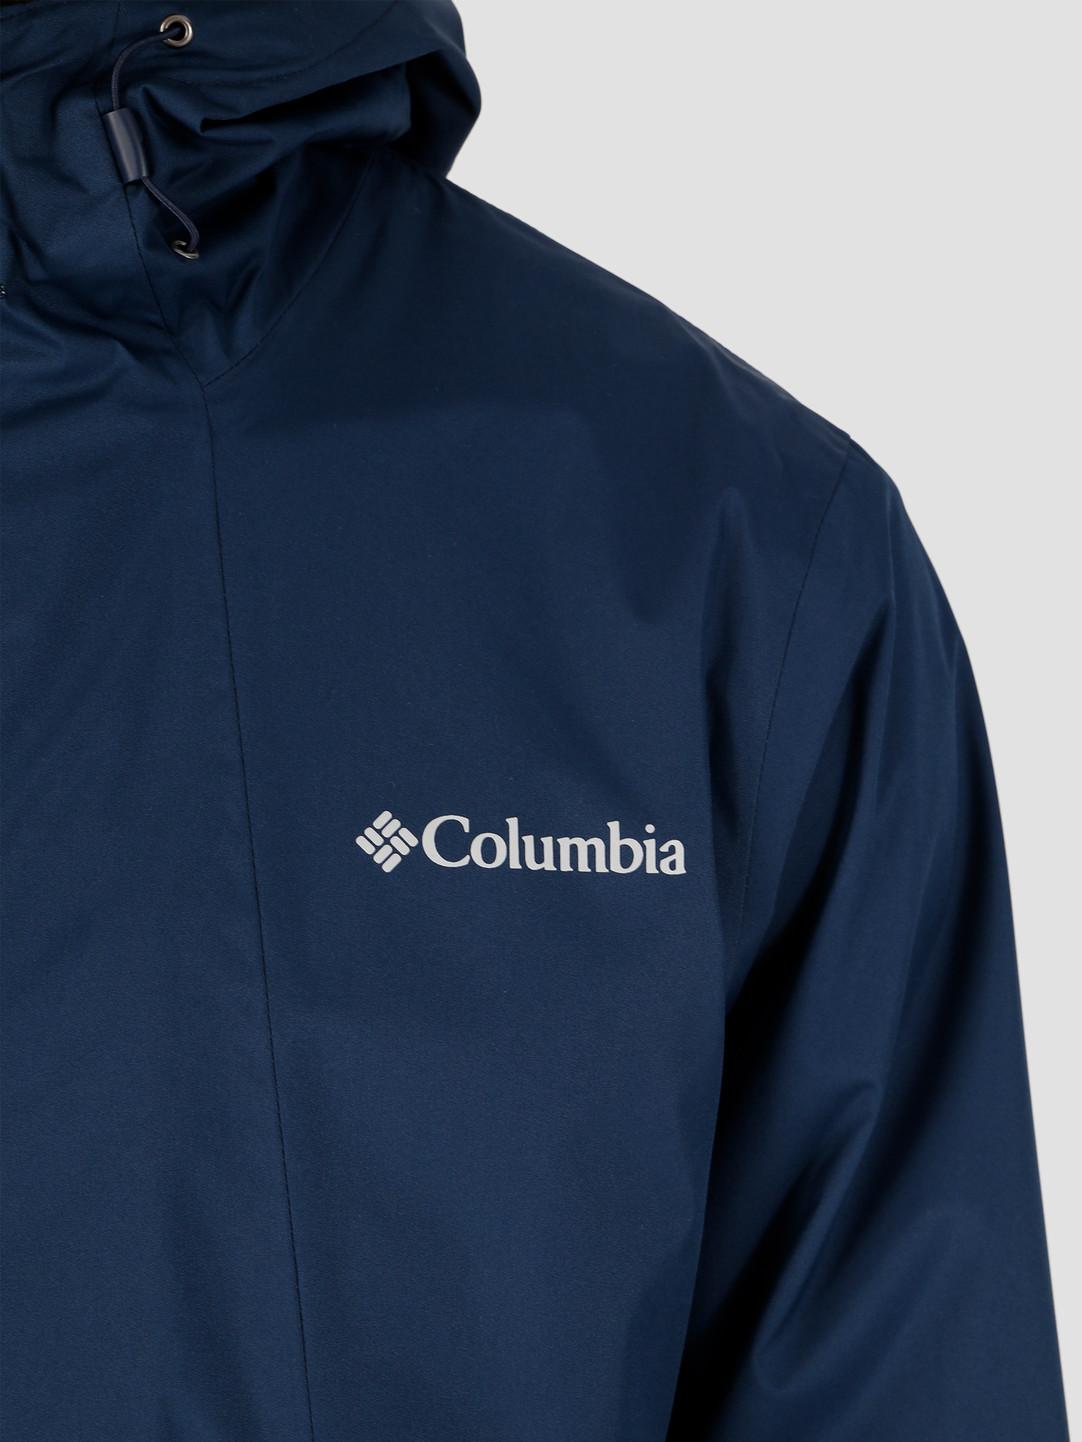 Columbia Columbia Inner Limits II Jacket Collegiate Navy 1893991465